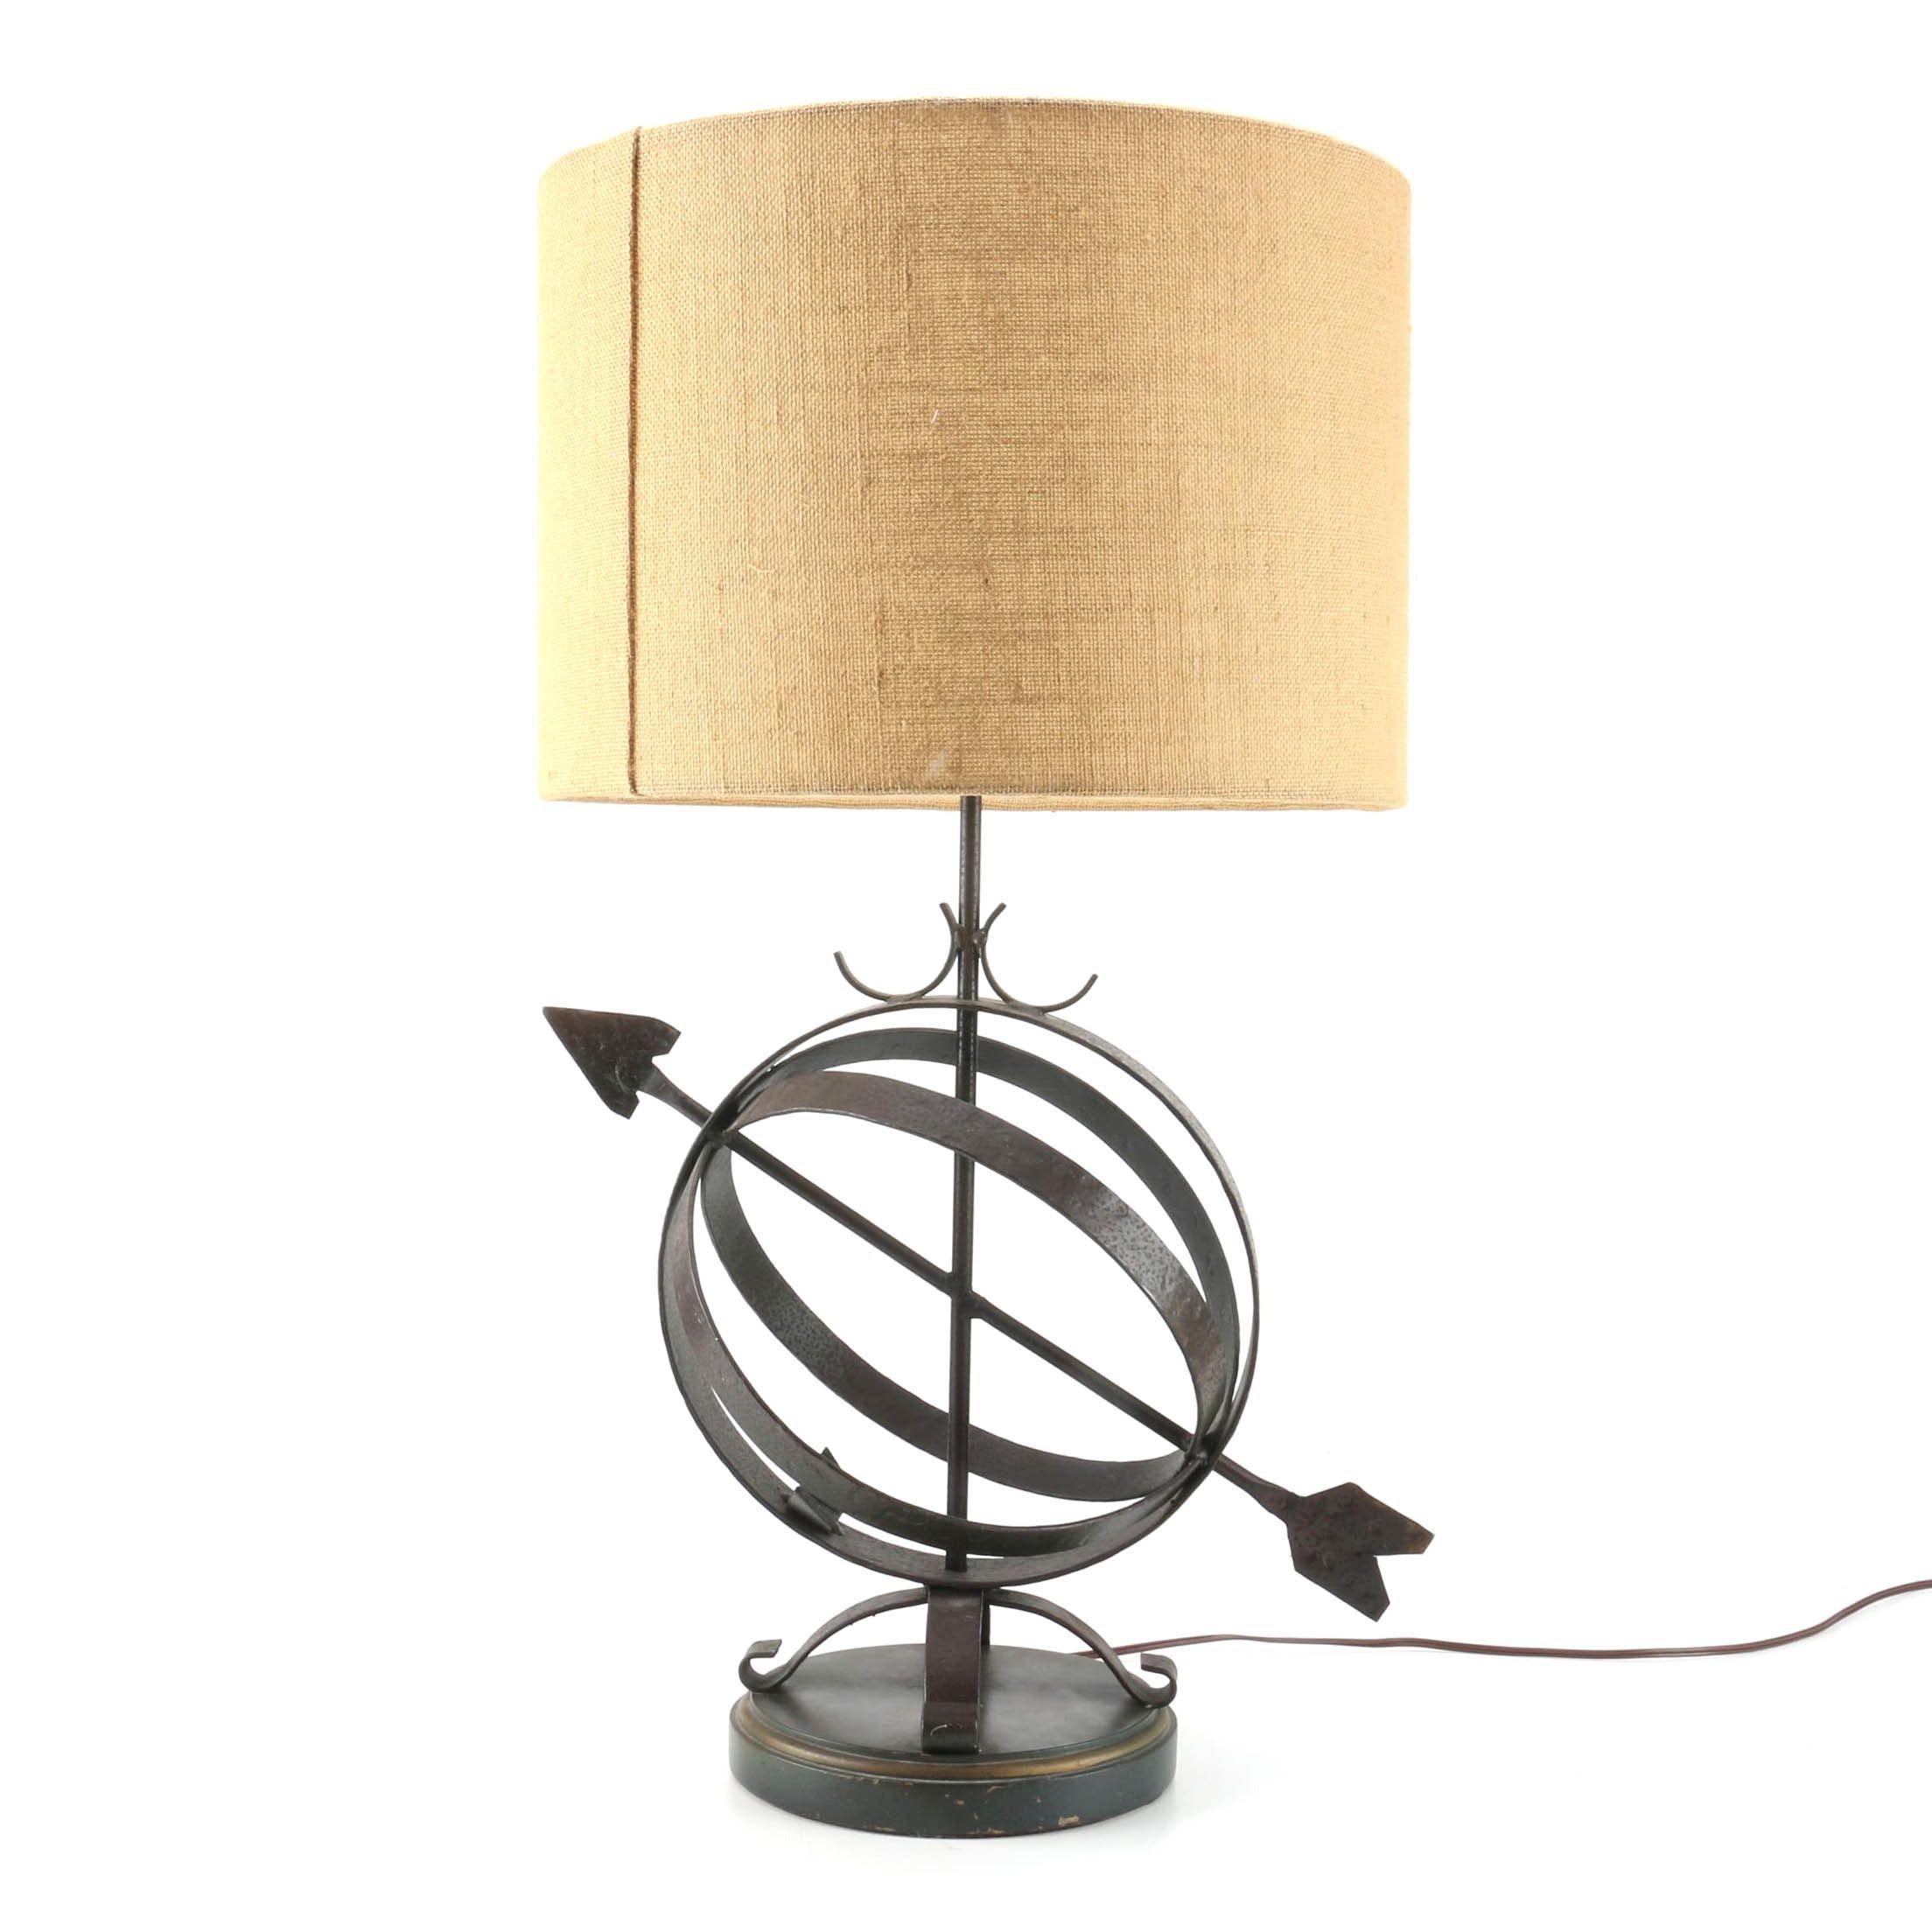 Cindy Ciskowski Los Angeles Armillary Sphere Accent Lamp